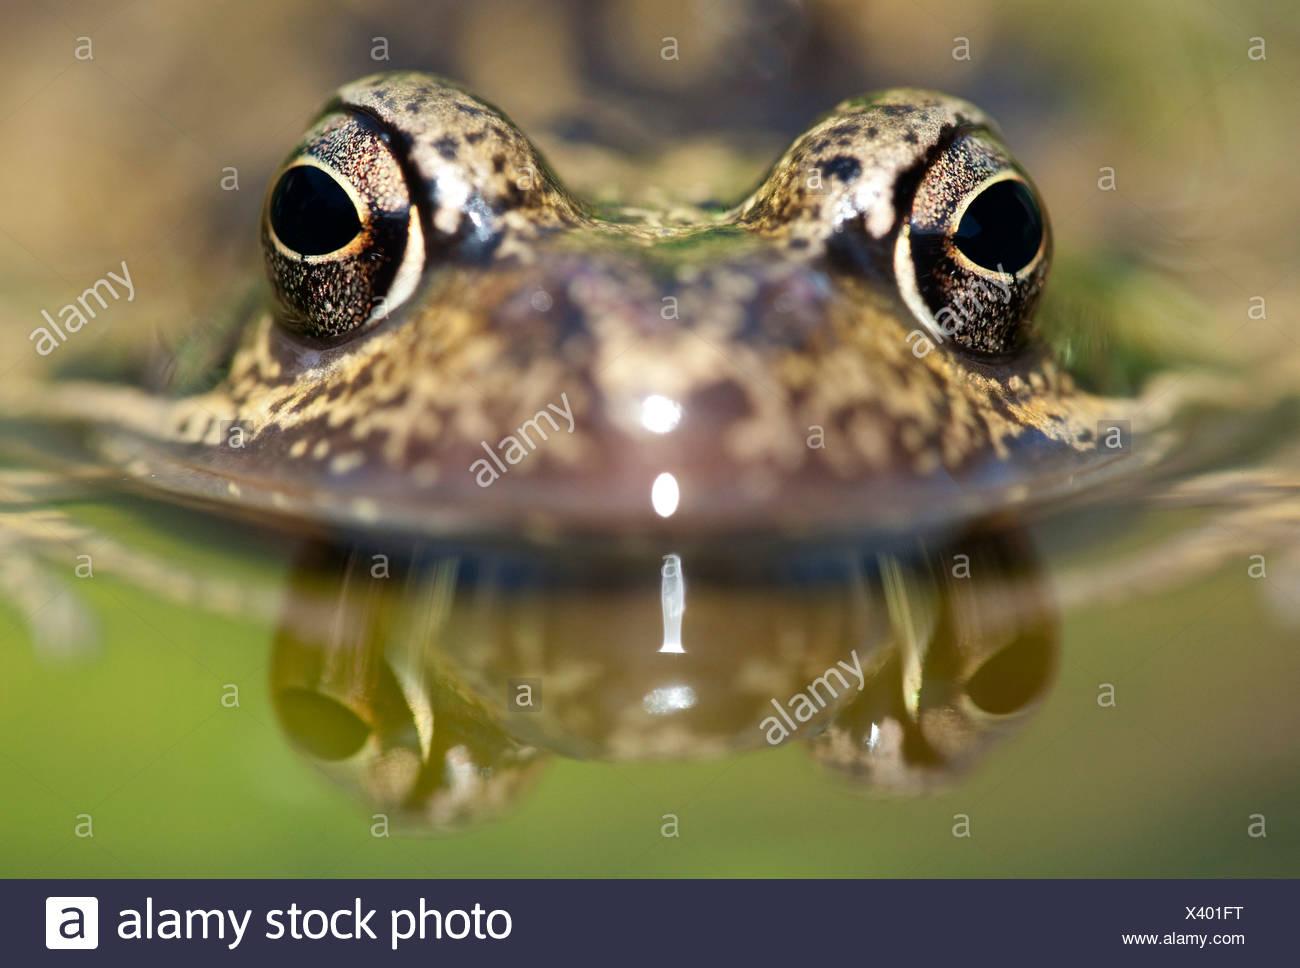 Common Frog Rana temporaria UK - Stock Image